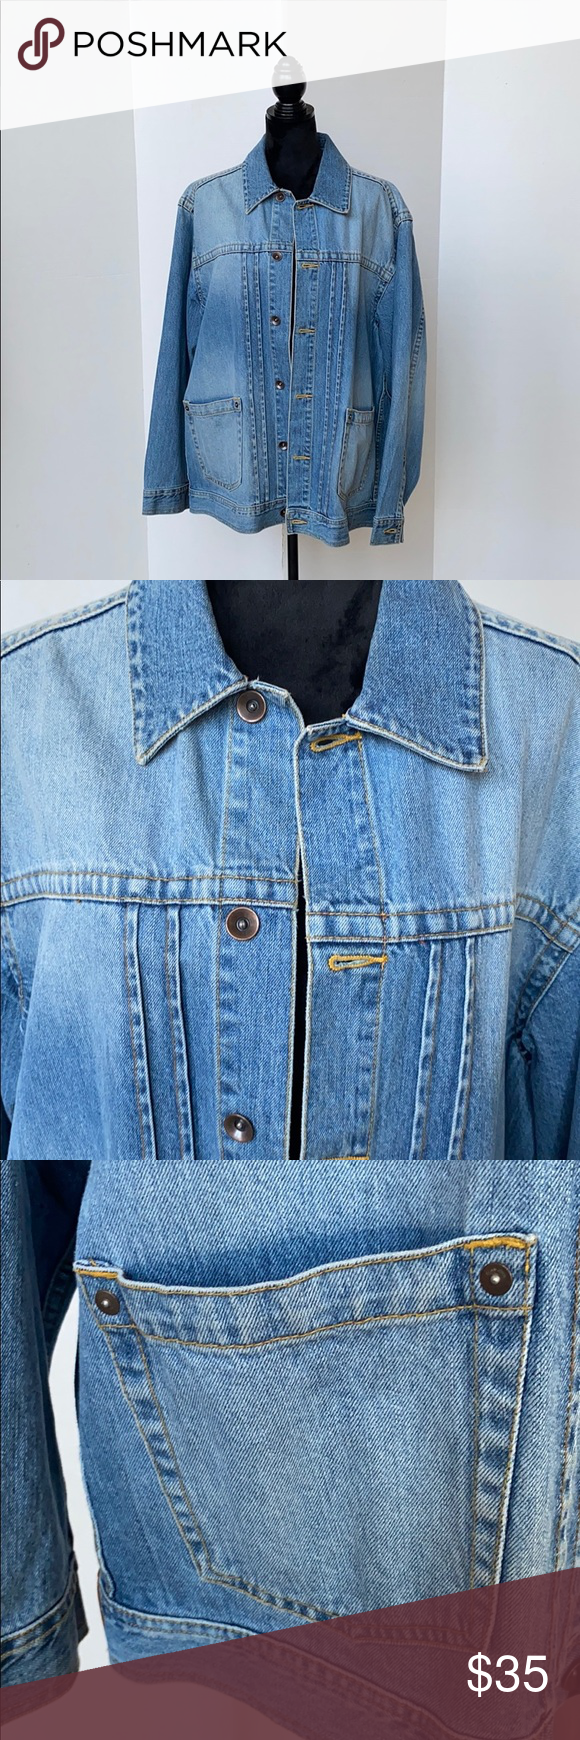 Men S Sean John Denim Jacket Size L Denim Jacket Denim Fabric Black Denim Jacket [ 1740 x 580 Pixel ]